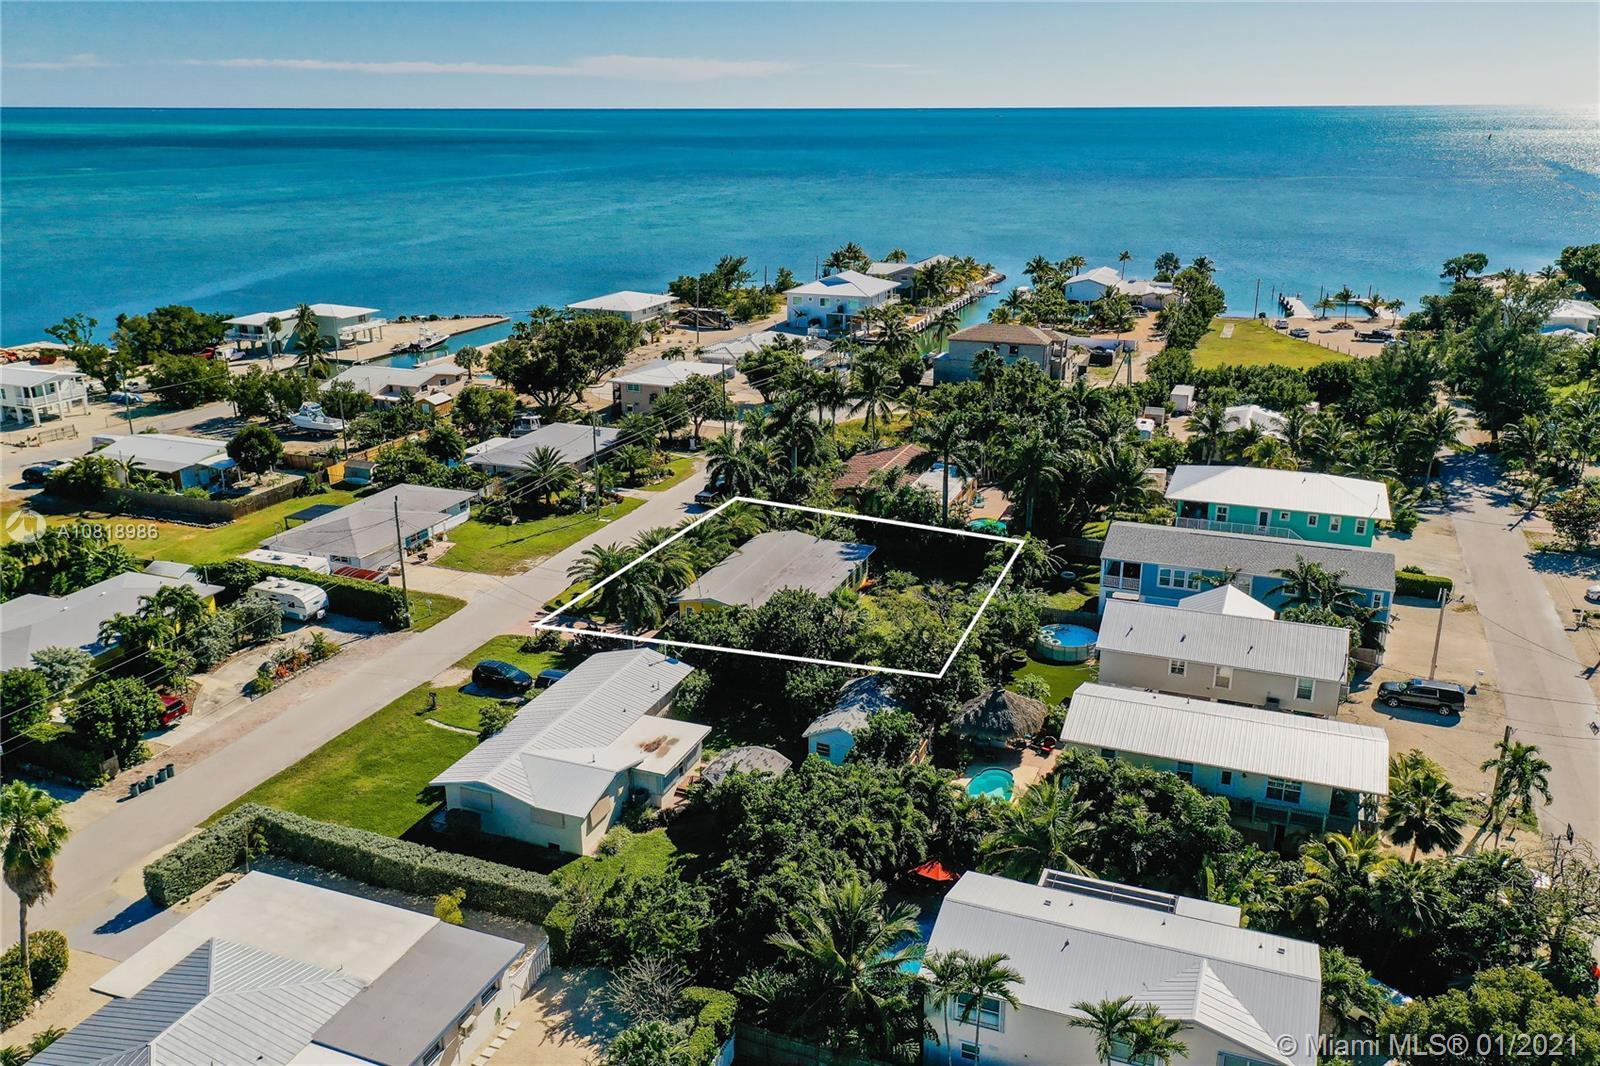 977 79th Street Ocean Property Photo